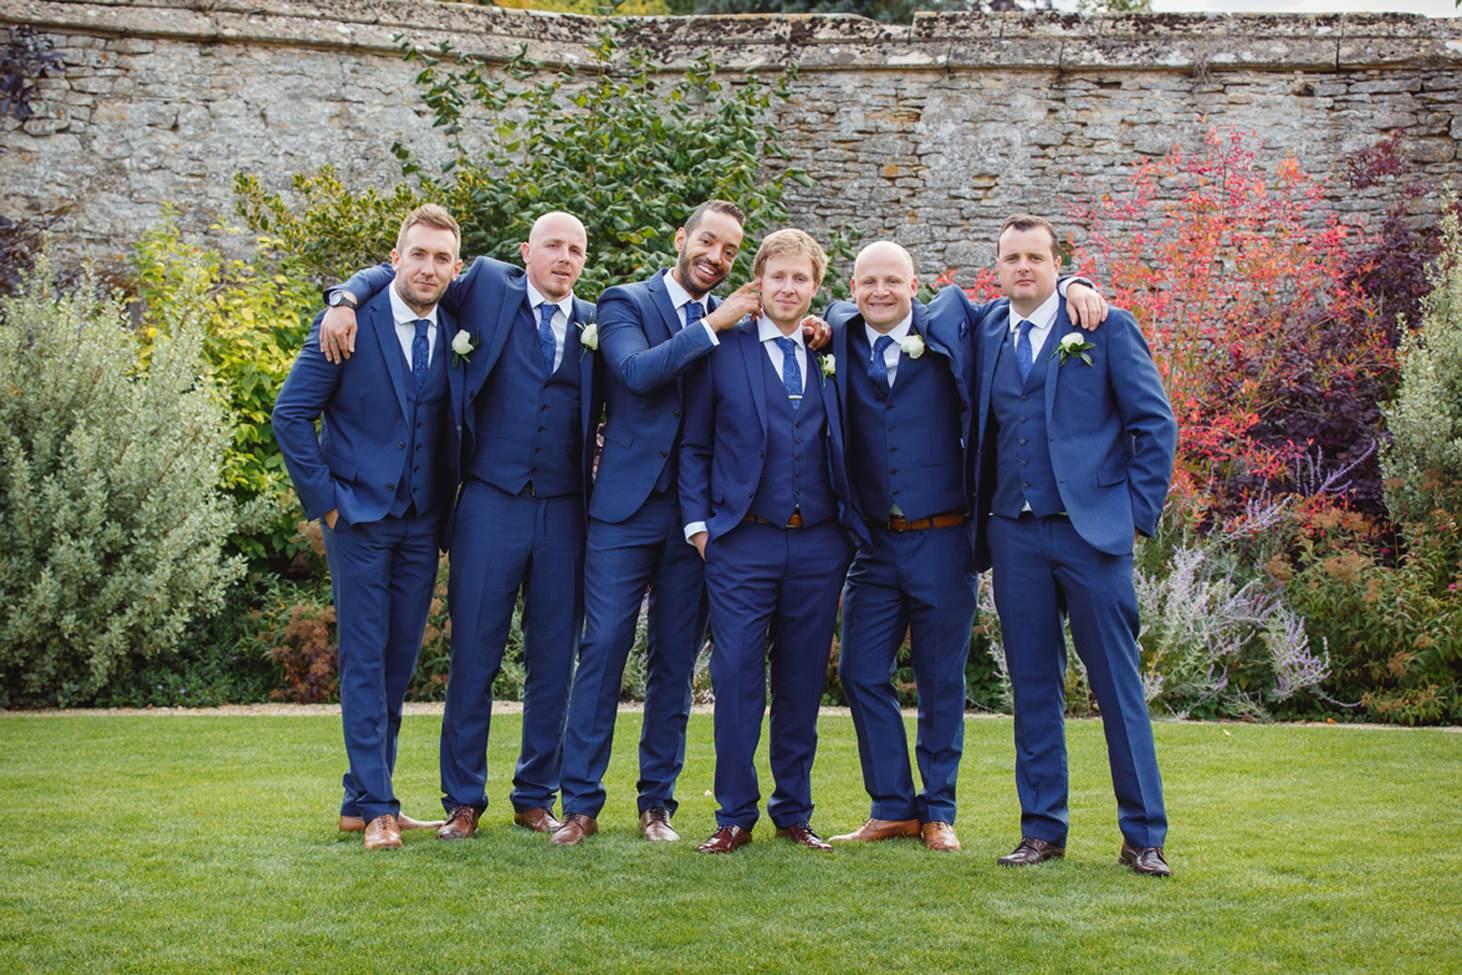 caswell house wedding photography groomsmen together